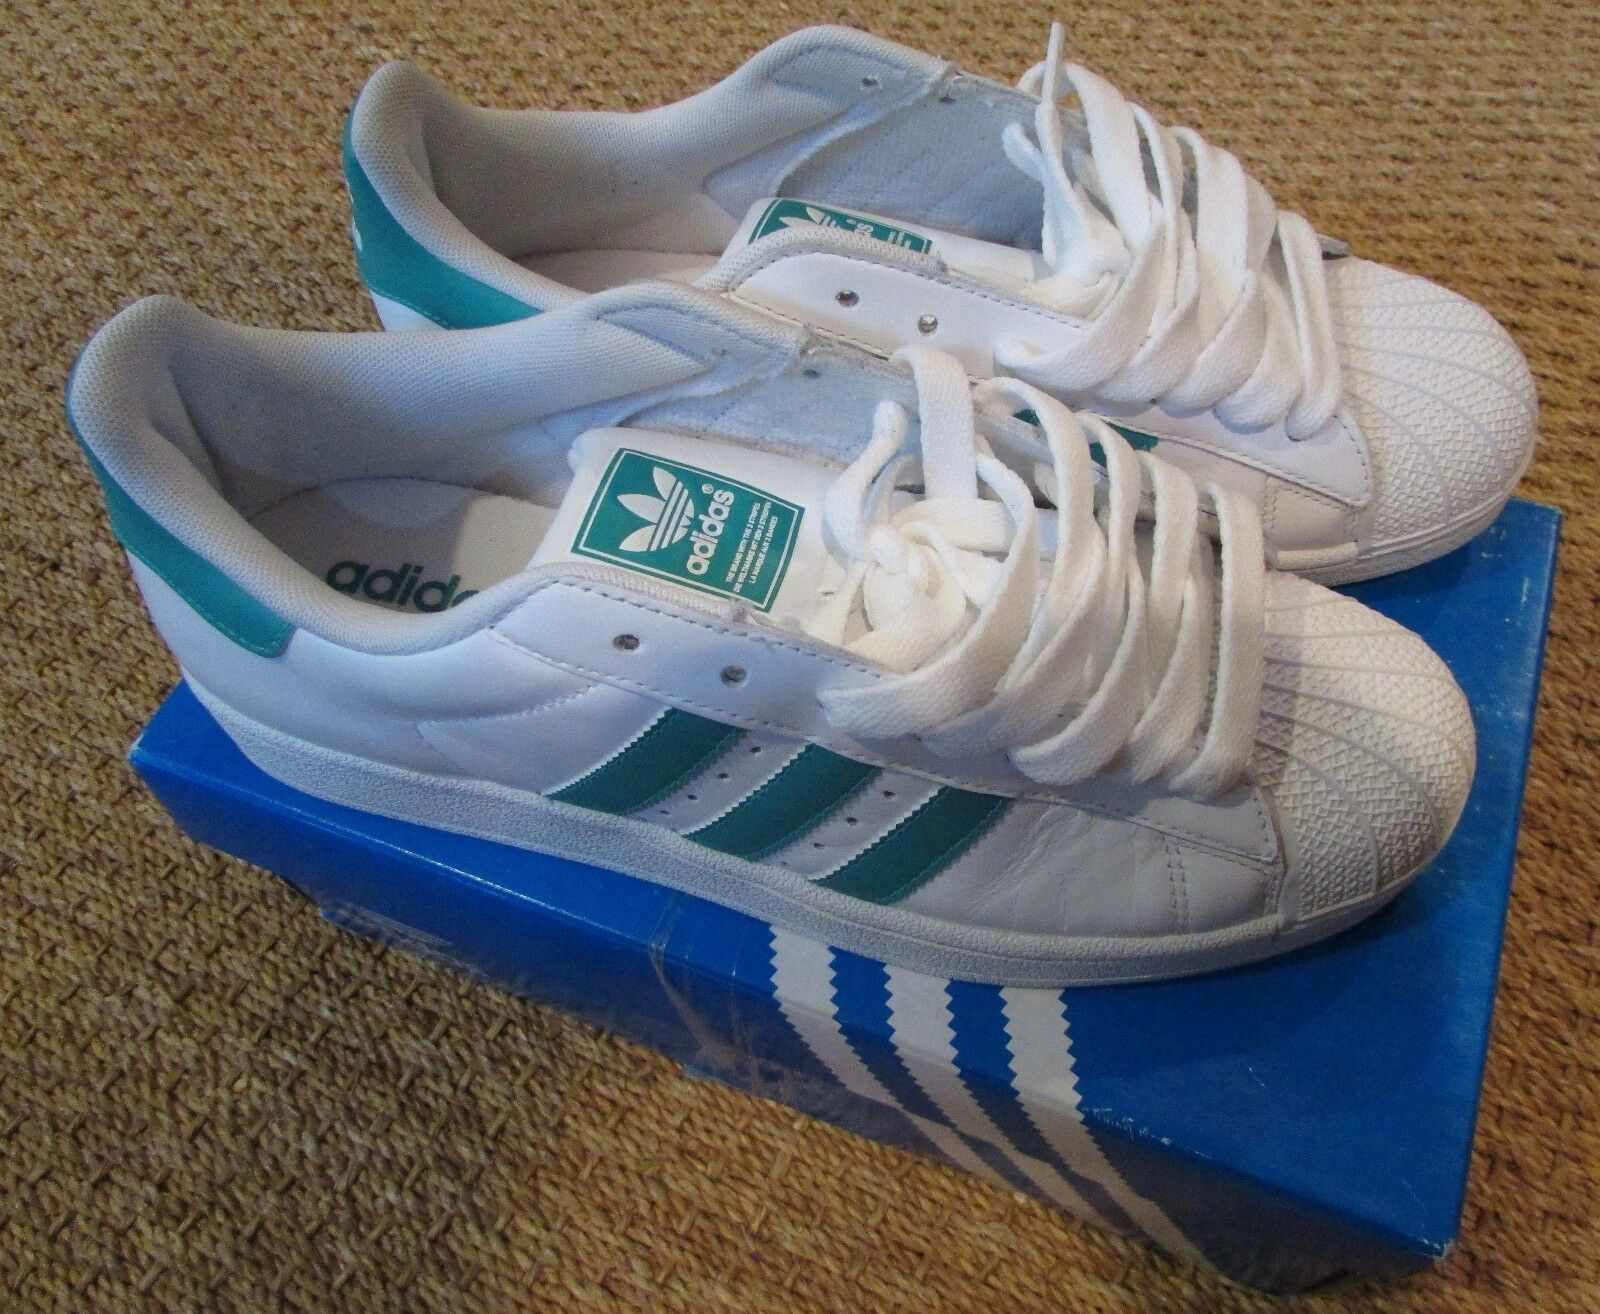 Adidas Superstar II Sneakers Athletic Shoes White Aero Reef Original Box Sz 8.5